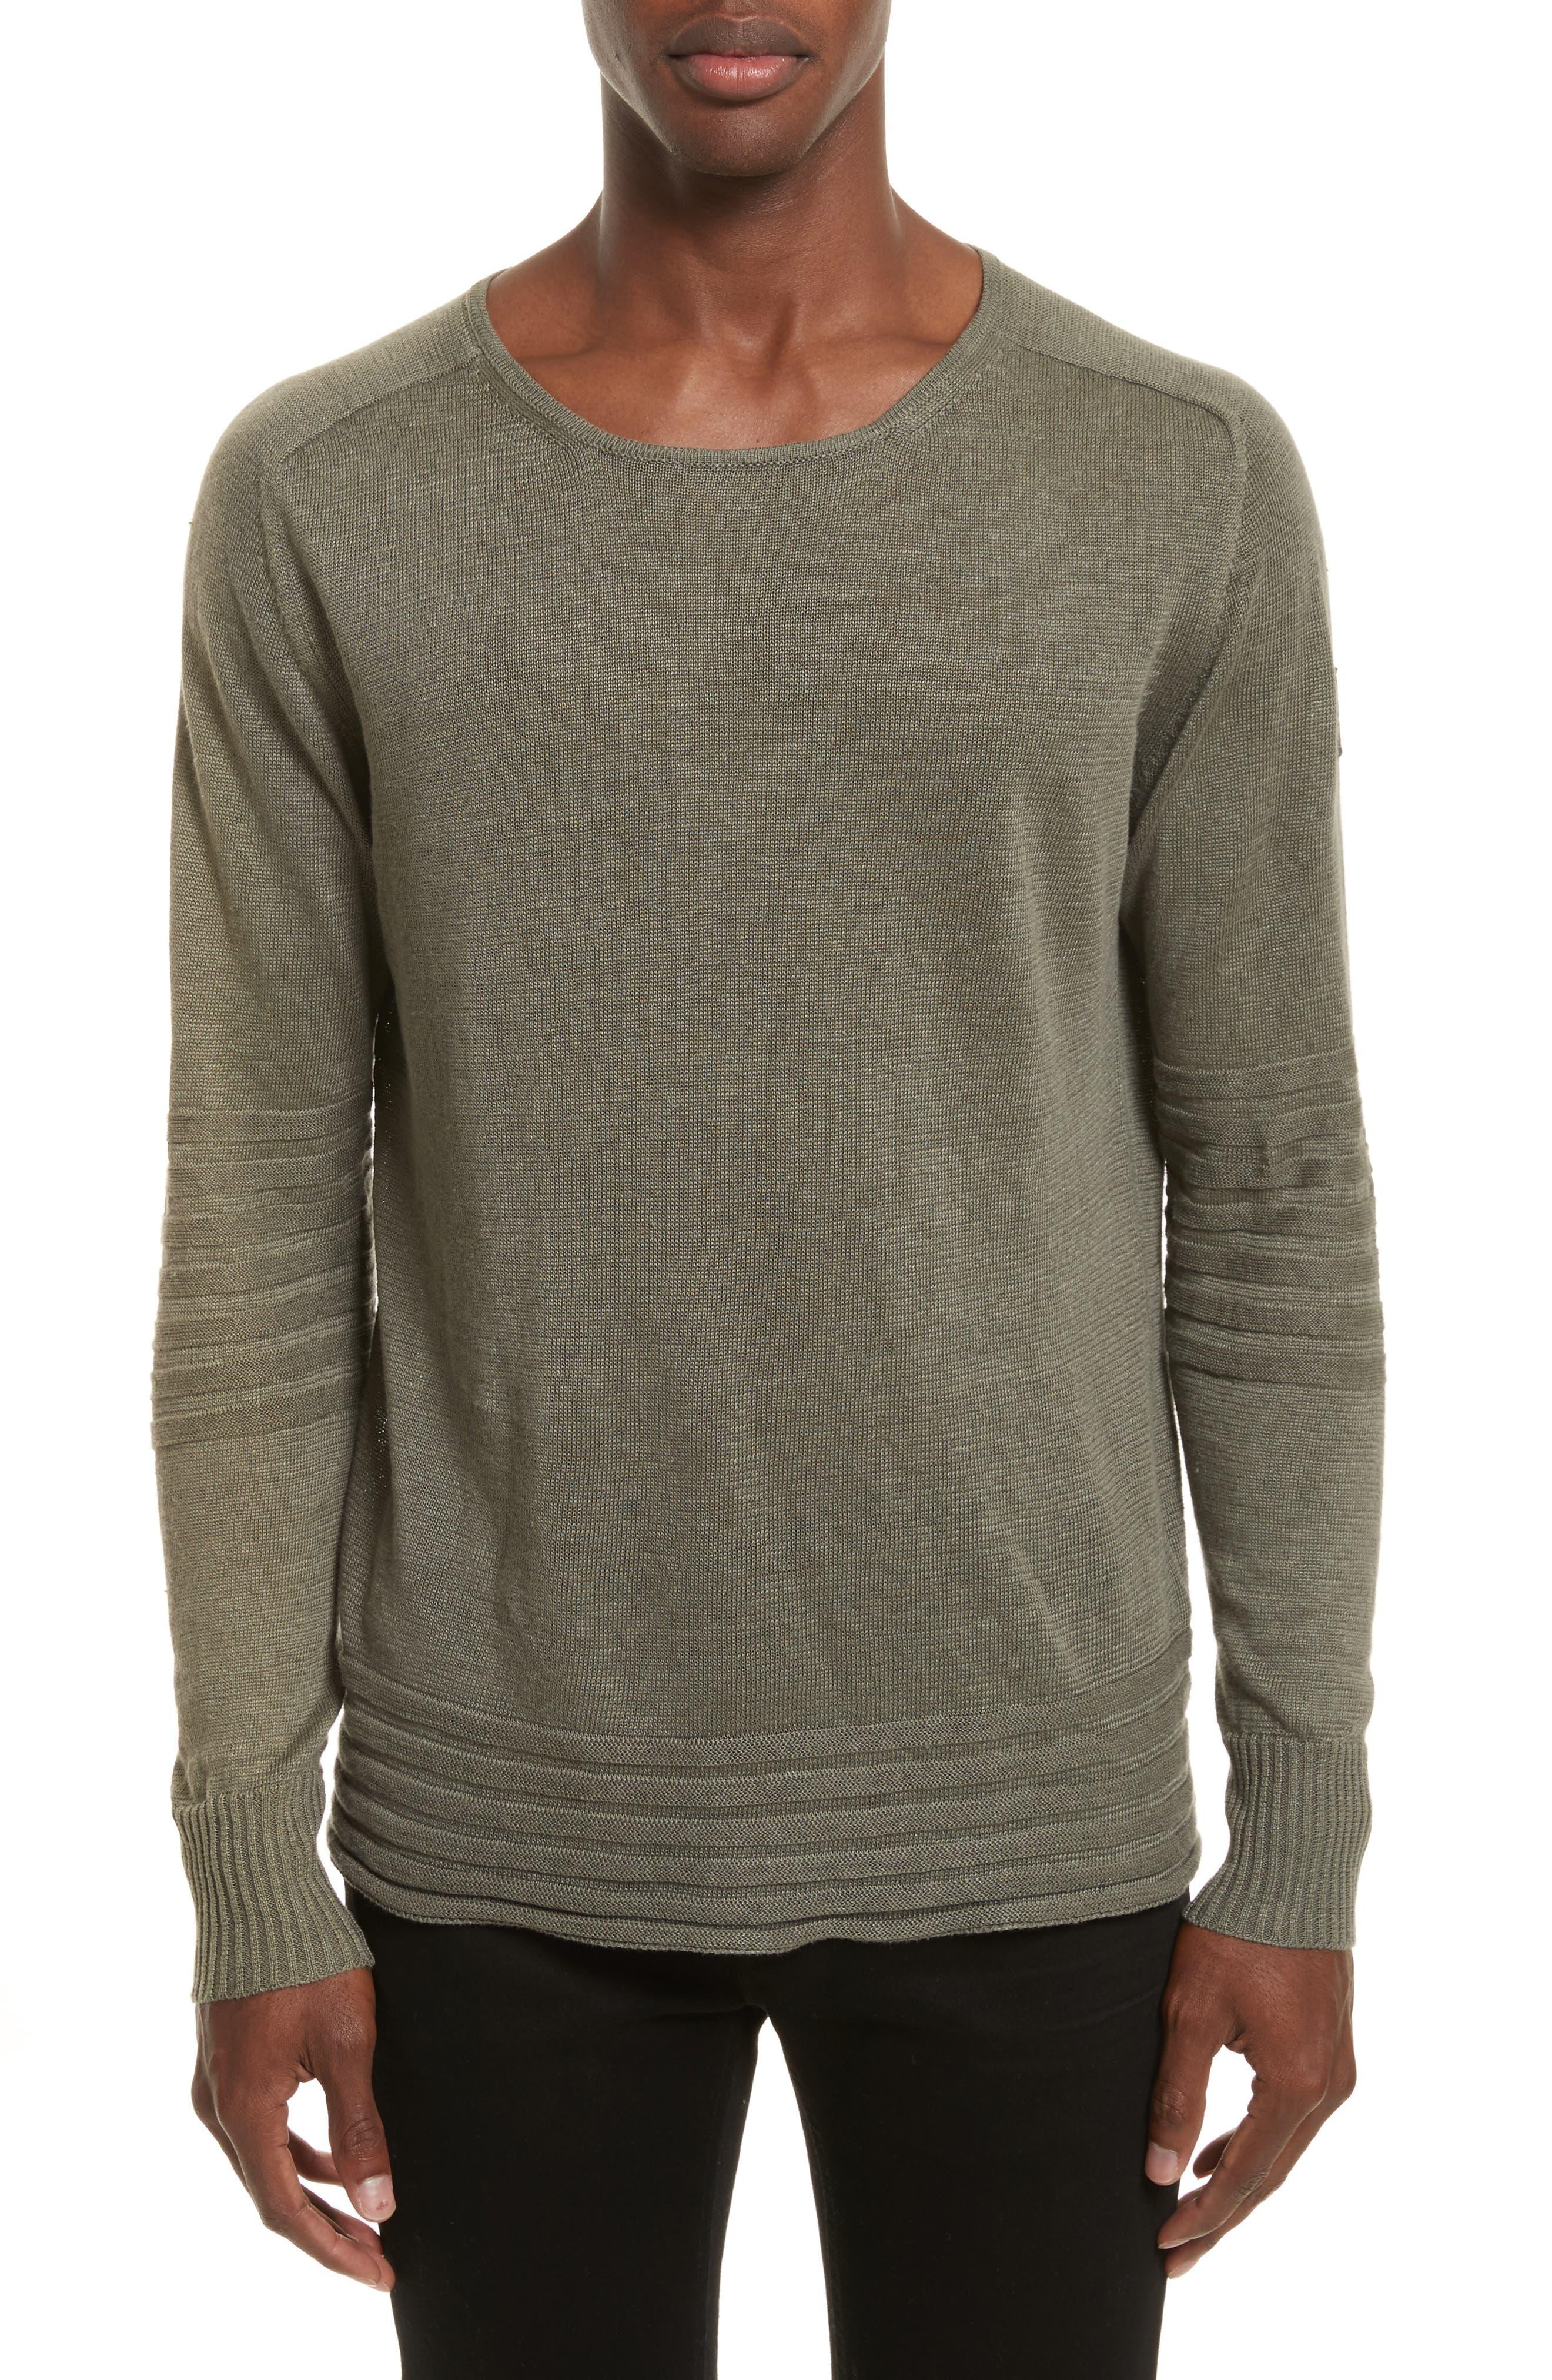 Alternate Image 1 Selected - Belstaff Exford Linen Crewneck Sweater